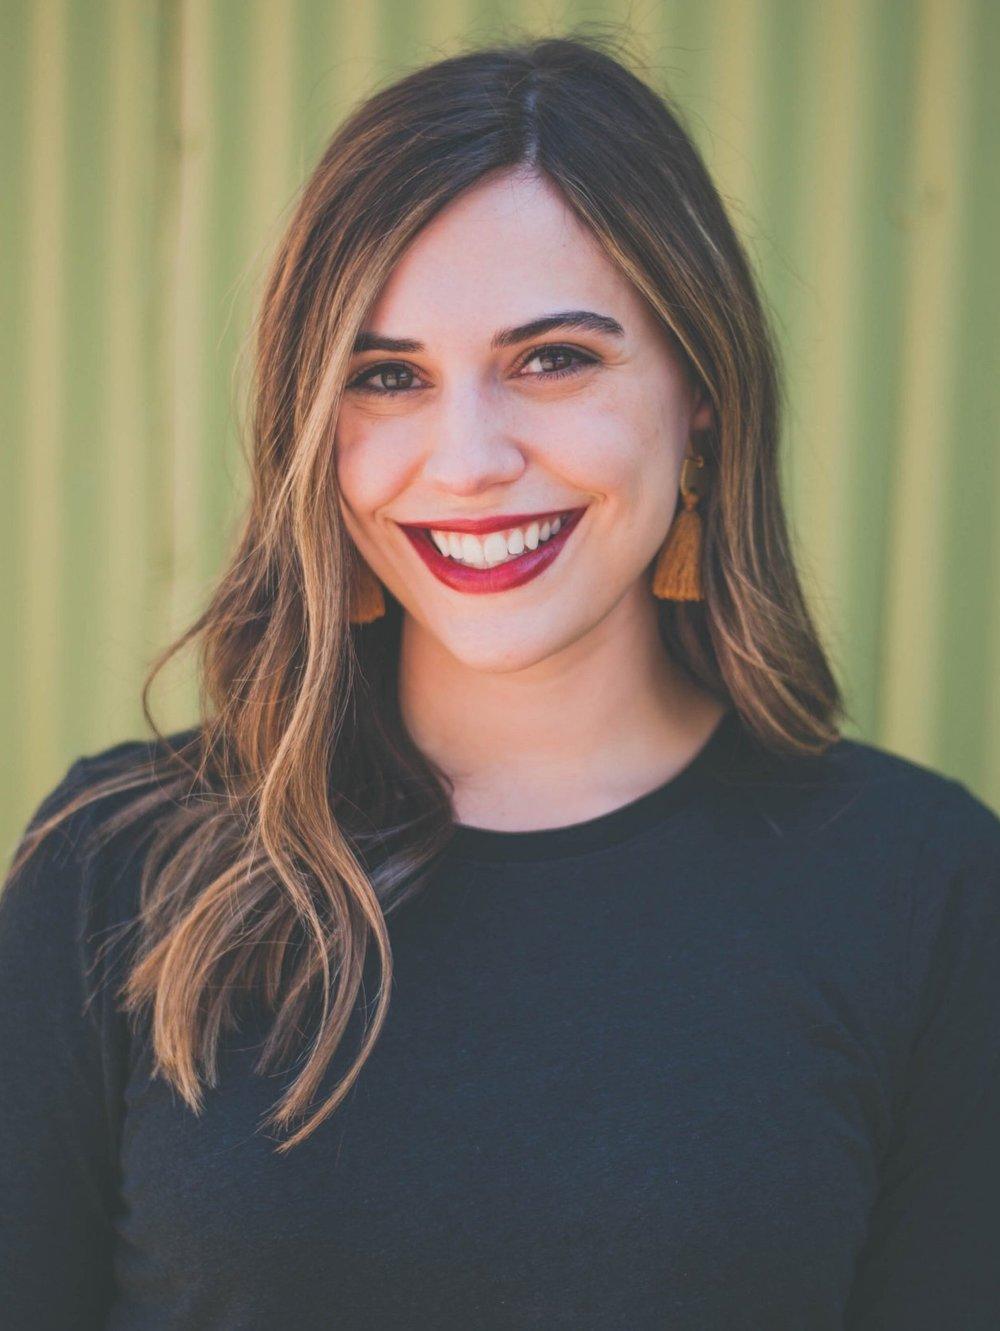 Candice Janowiak, Wedding and Event Coordinator